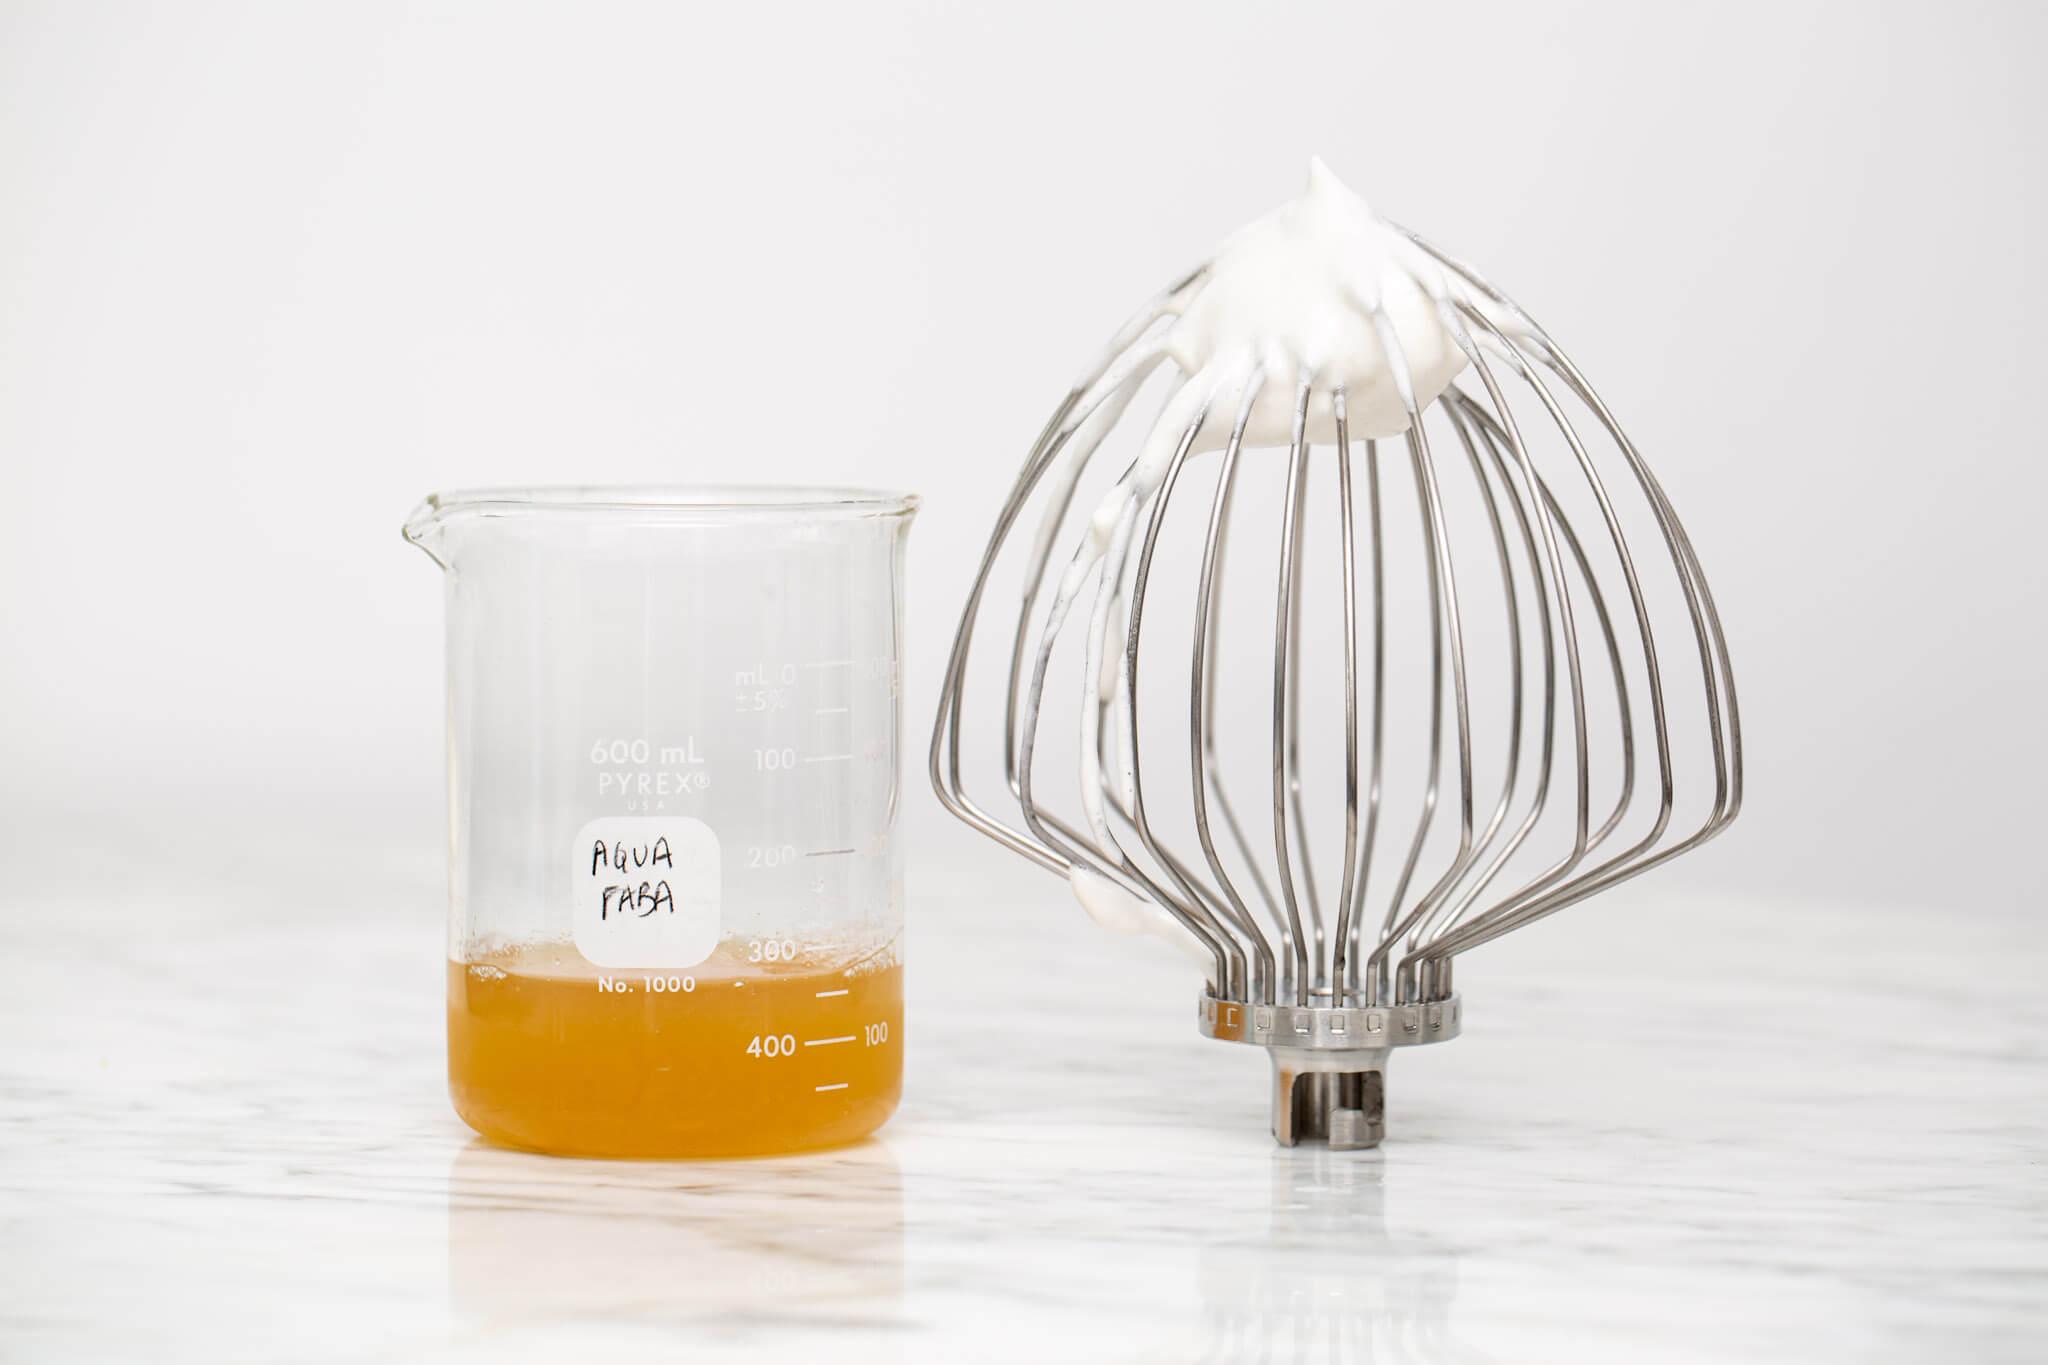 Liquid aquafaba beside whipped aquafaba as a vegan whipped egg white substitute